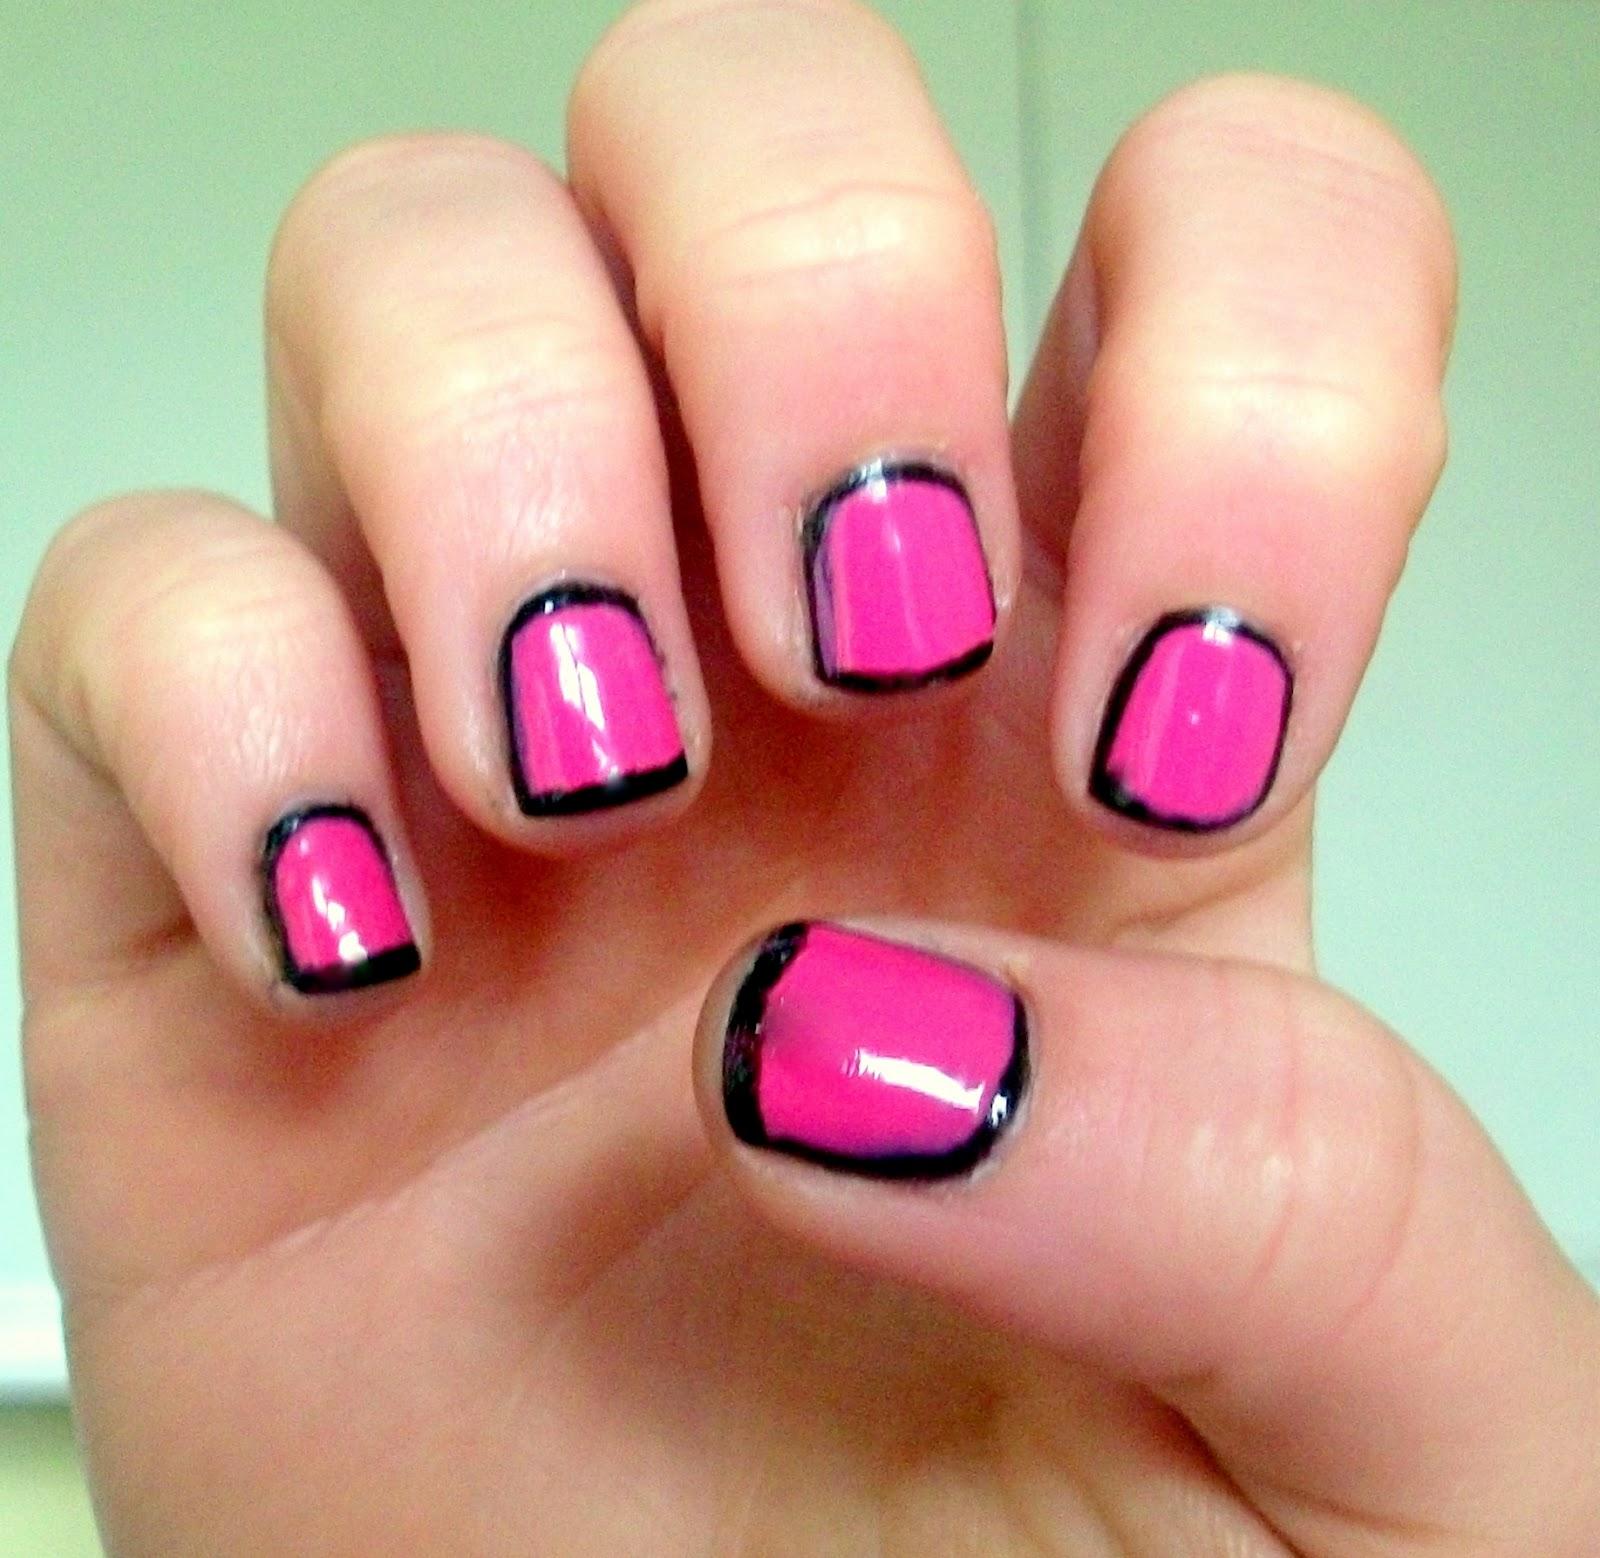 Nail Cute: GemSeren UK Beauty Blog: NOTD: Inspired By Cute Polish